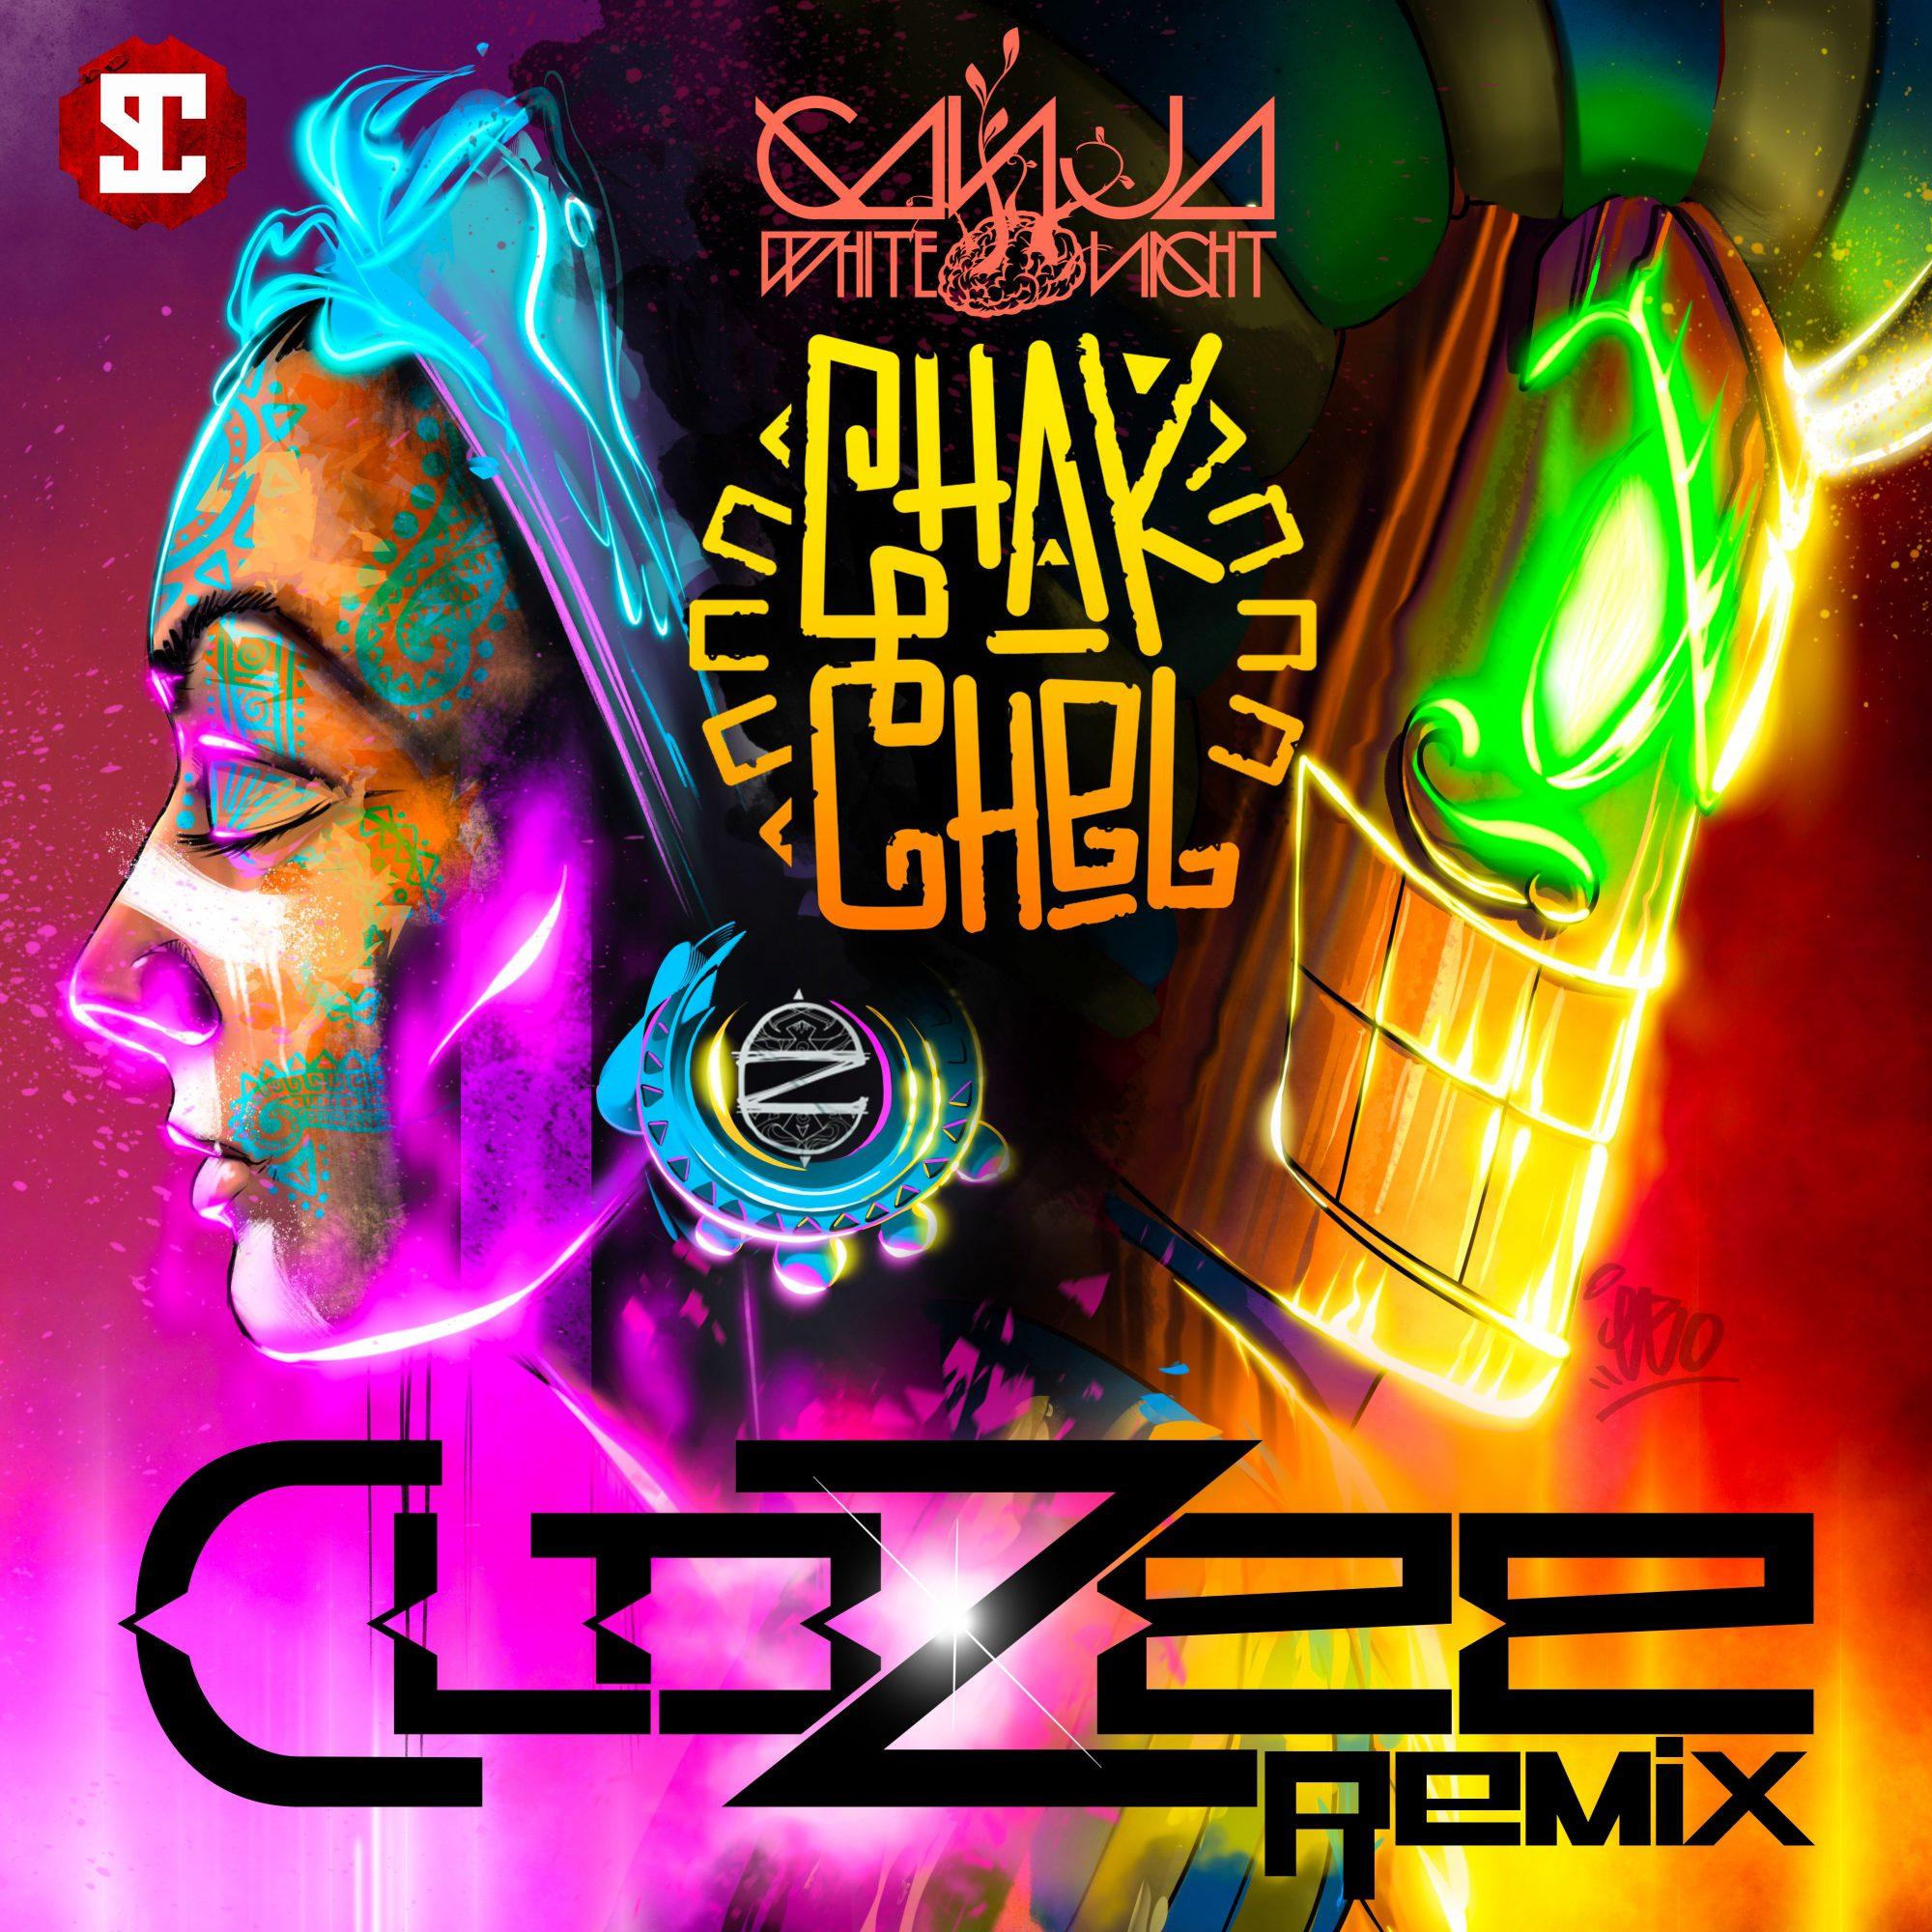 Ganja White Night Chak Chel (CloZee Remix)